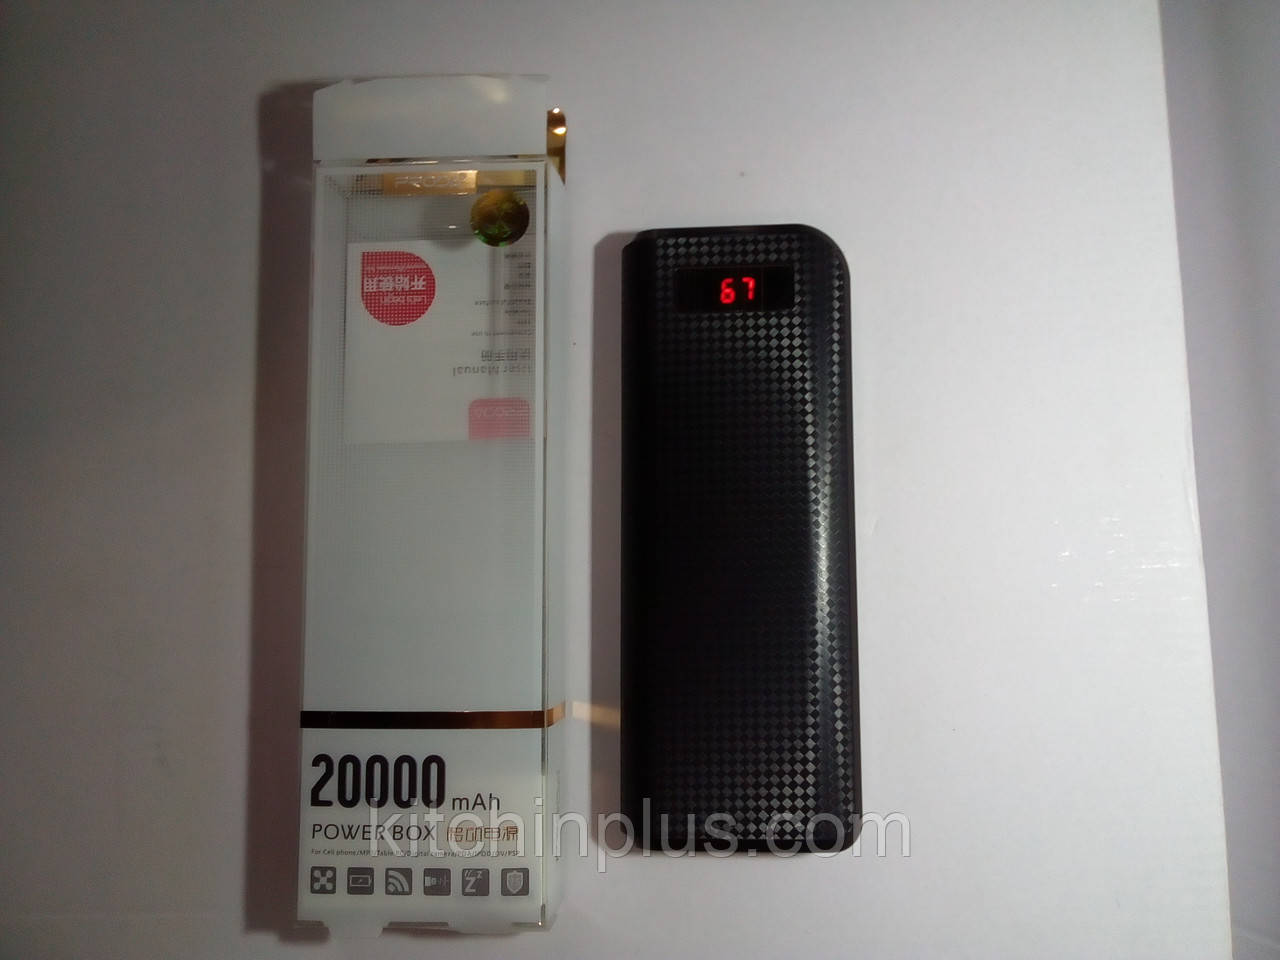 Power Bank Proda (20000 mAh) RE-6